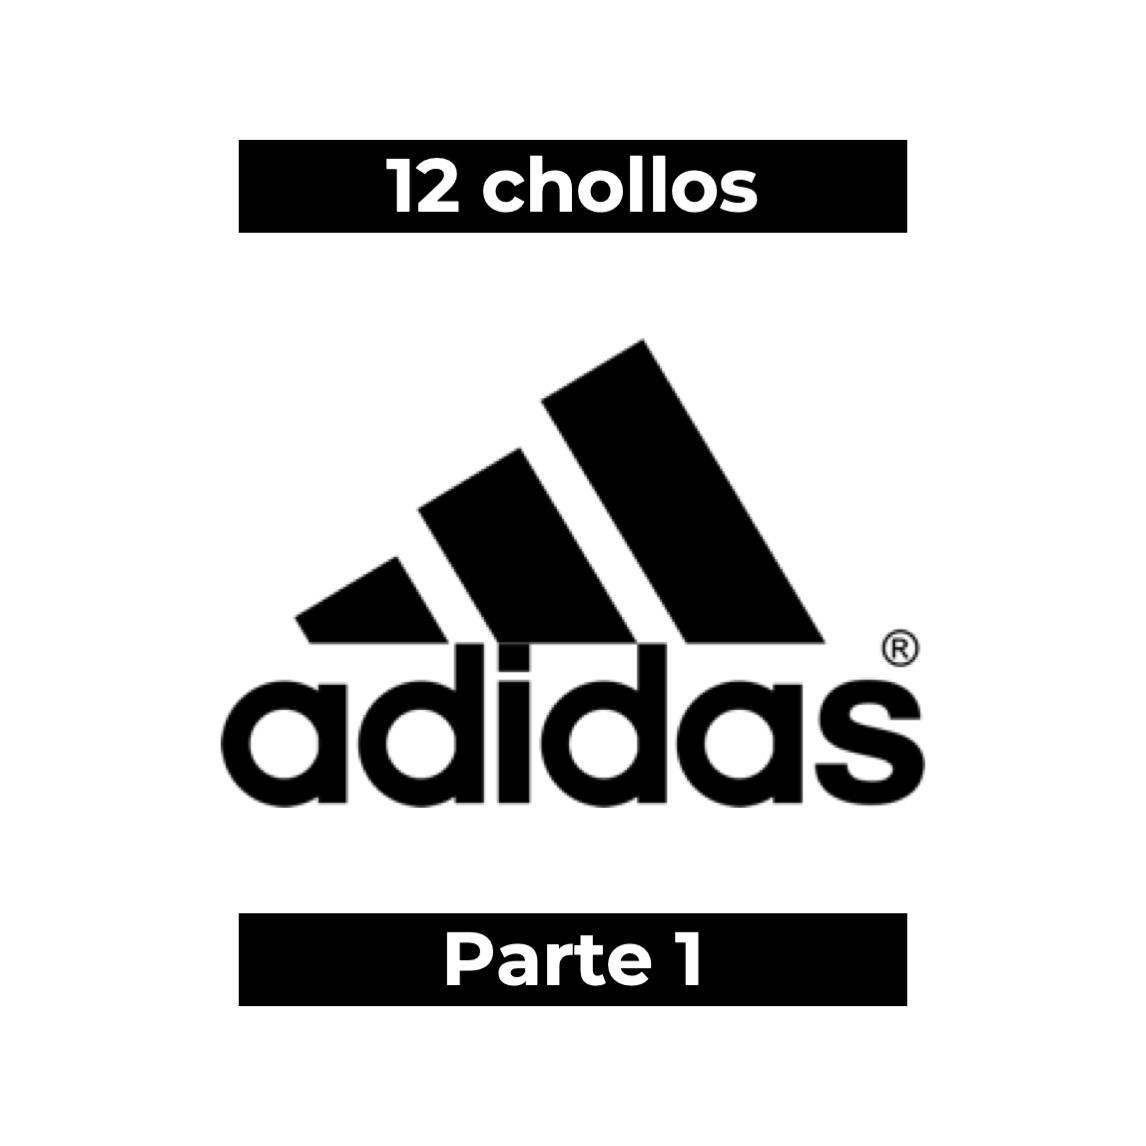 12 CHOLLAZOS ADIDAS - PARTE I